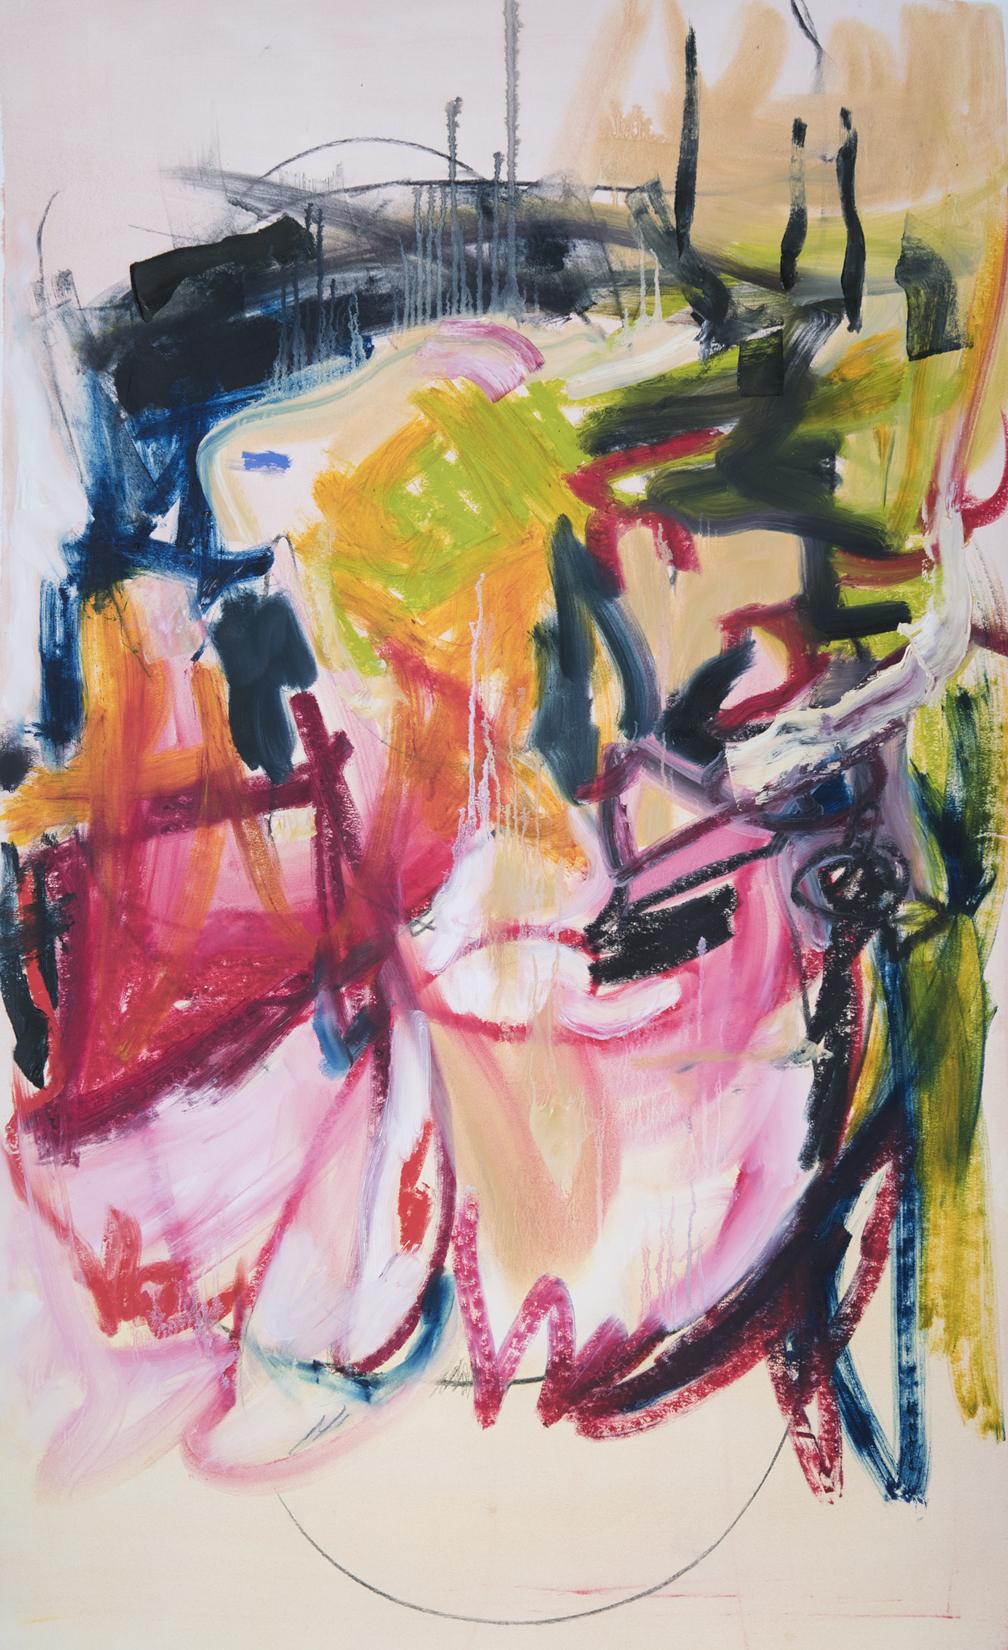 Gail Winbury / Through the Bramble